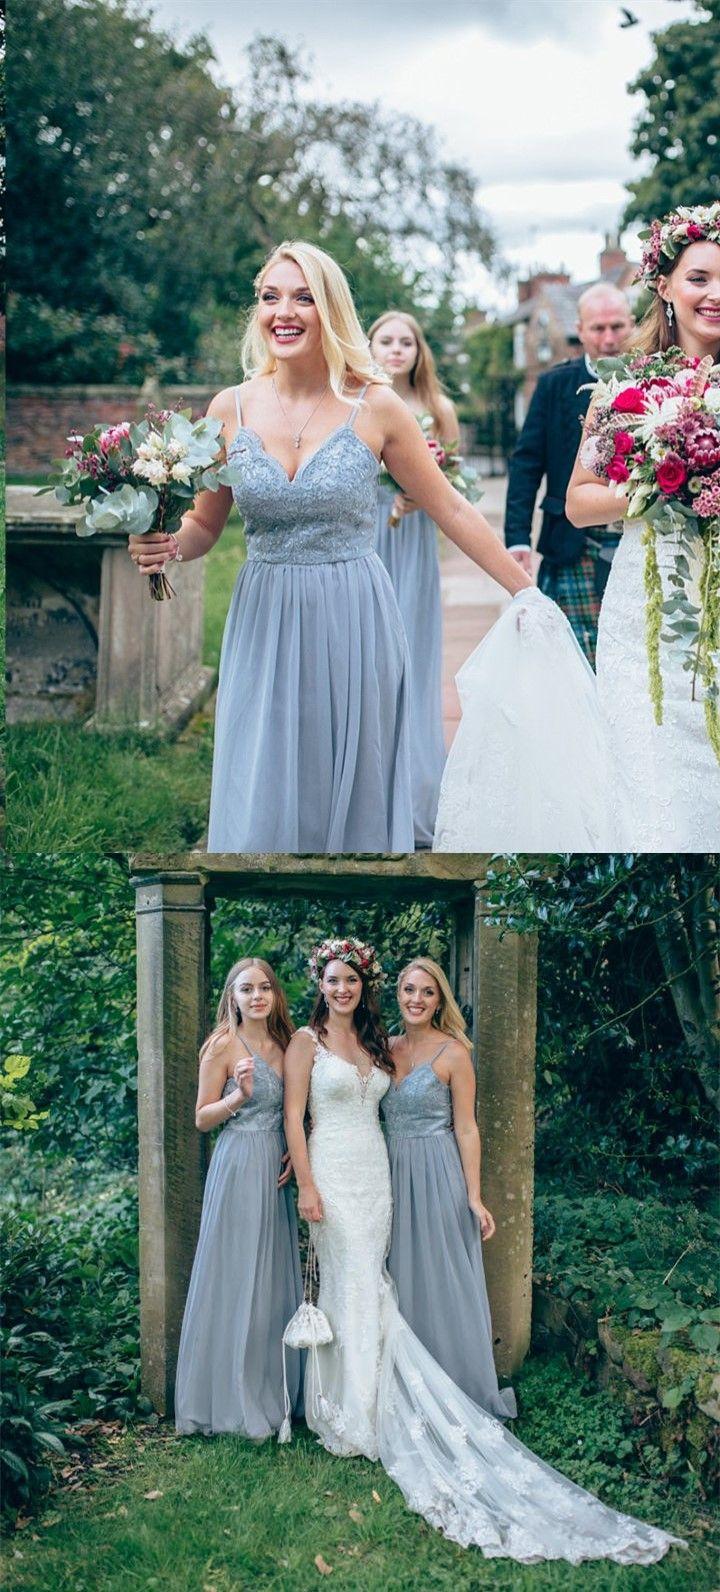 Aline spaghetti straps grey bridesmaid dress with beading lace